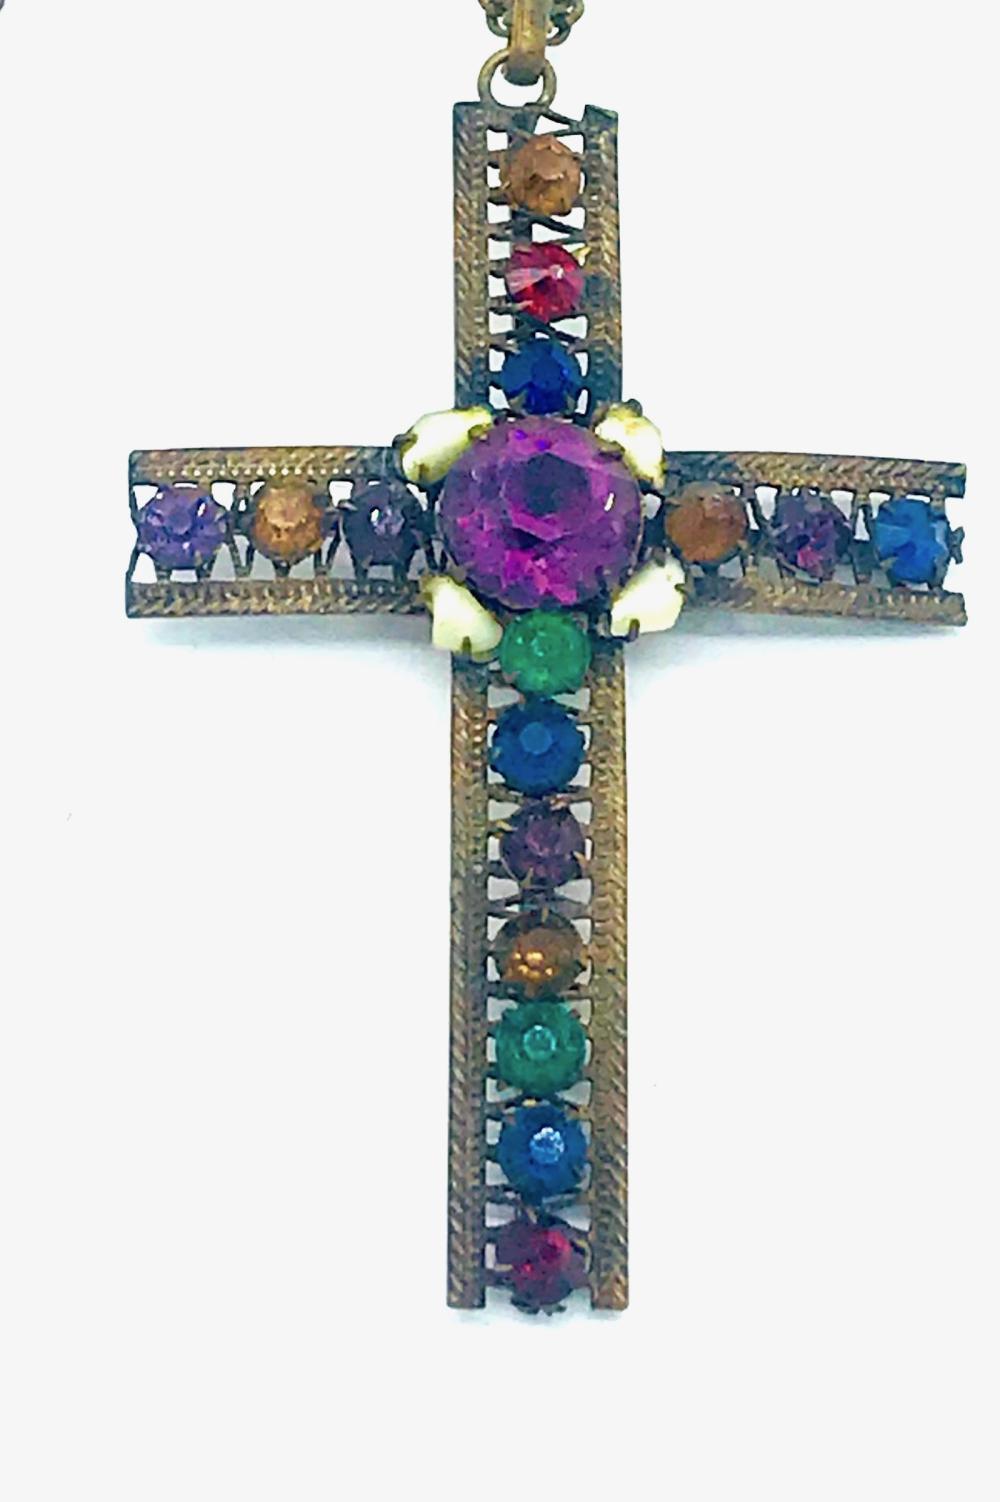 Lot 8658: Jumbo, 1910's Colored Cross, Seed Pearls, Handmade